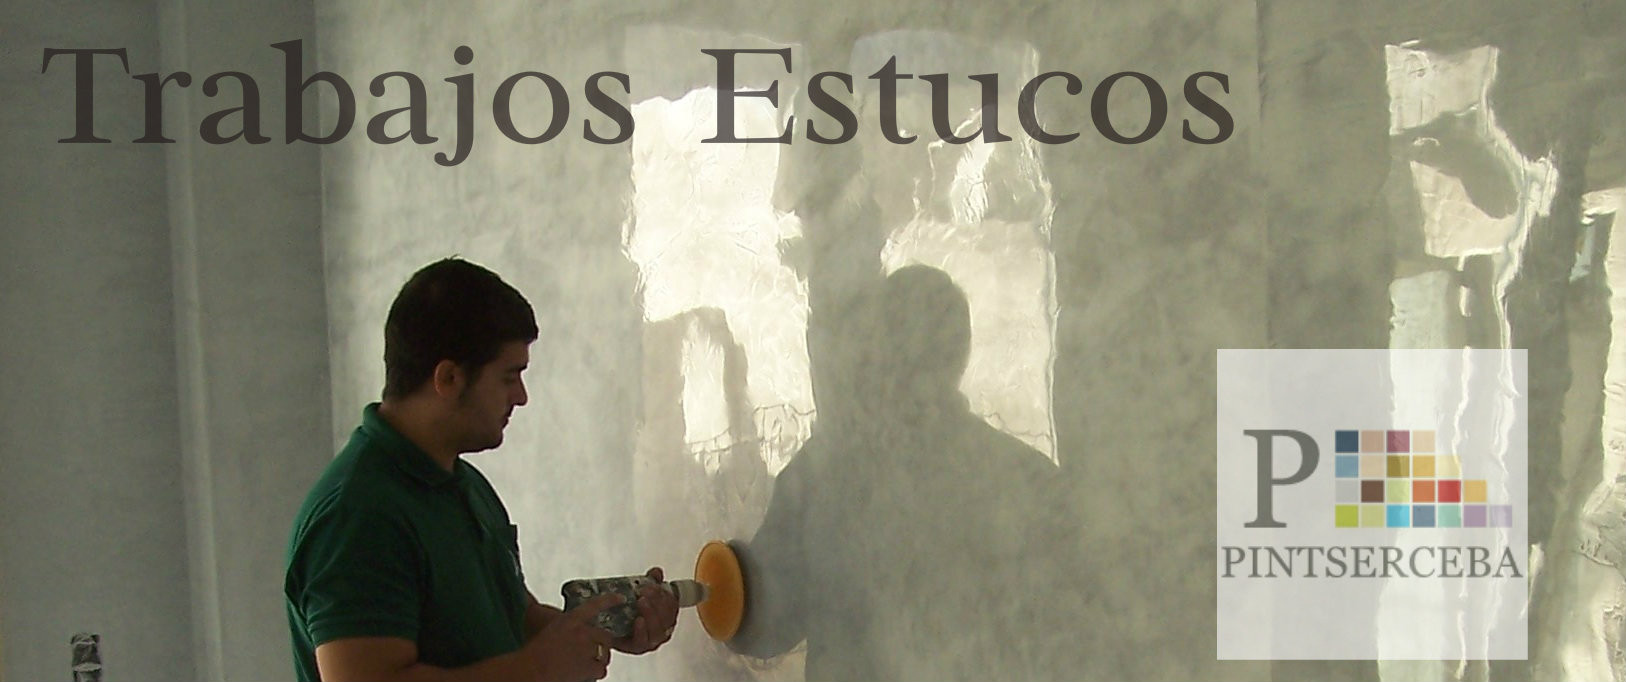 Servicio estucos pintor de casas valencia pintores - Fotos de estuco ...